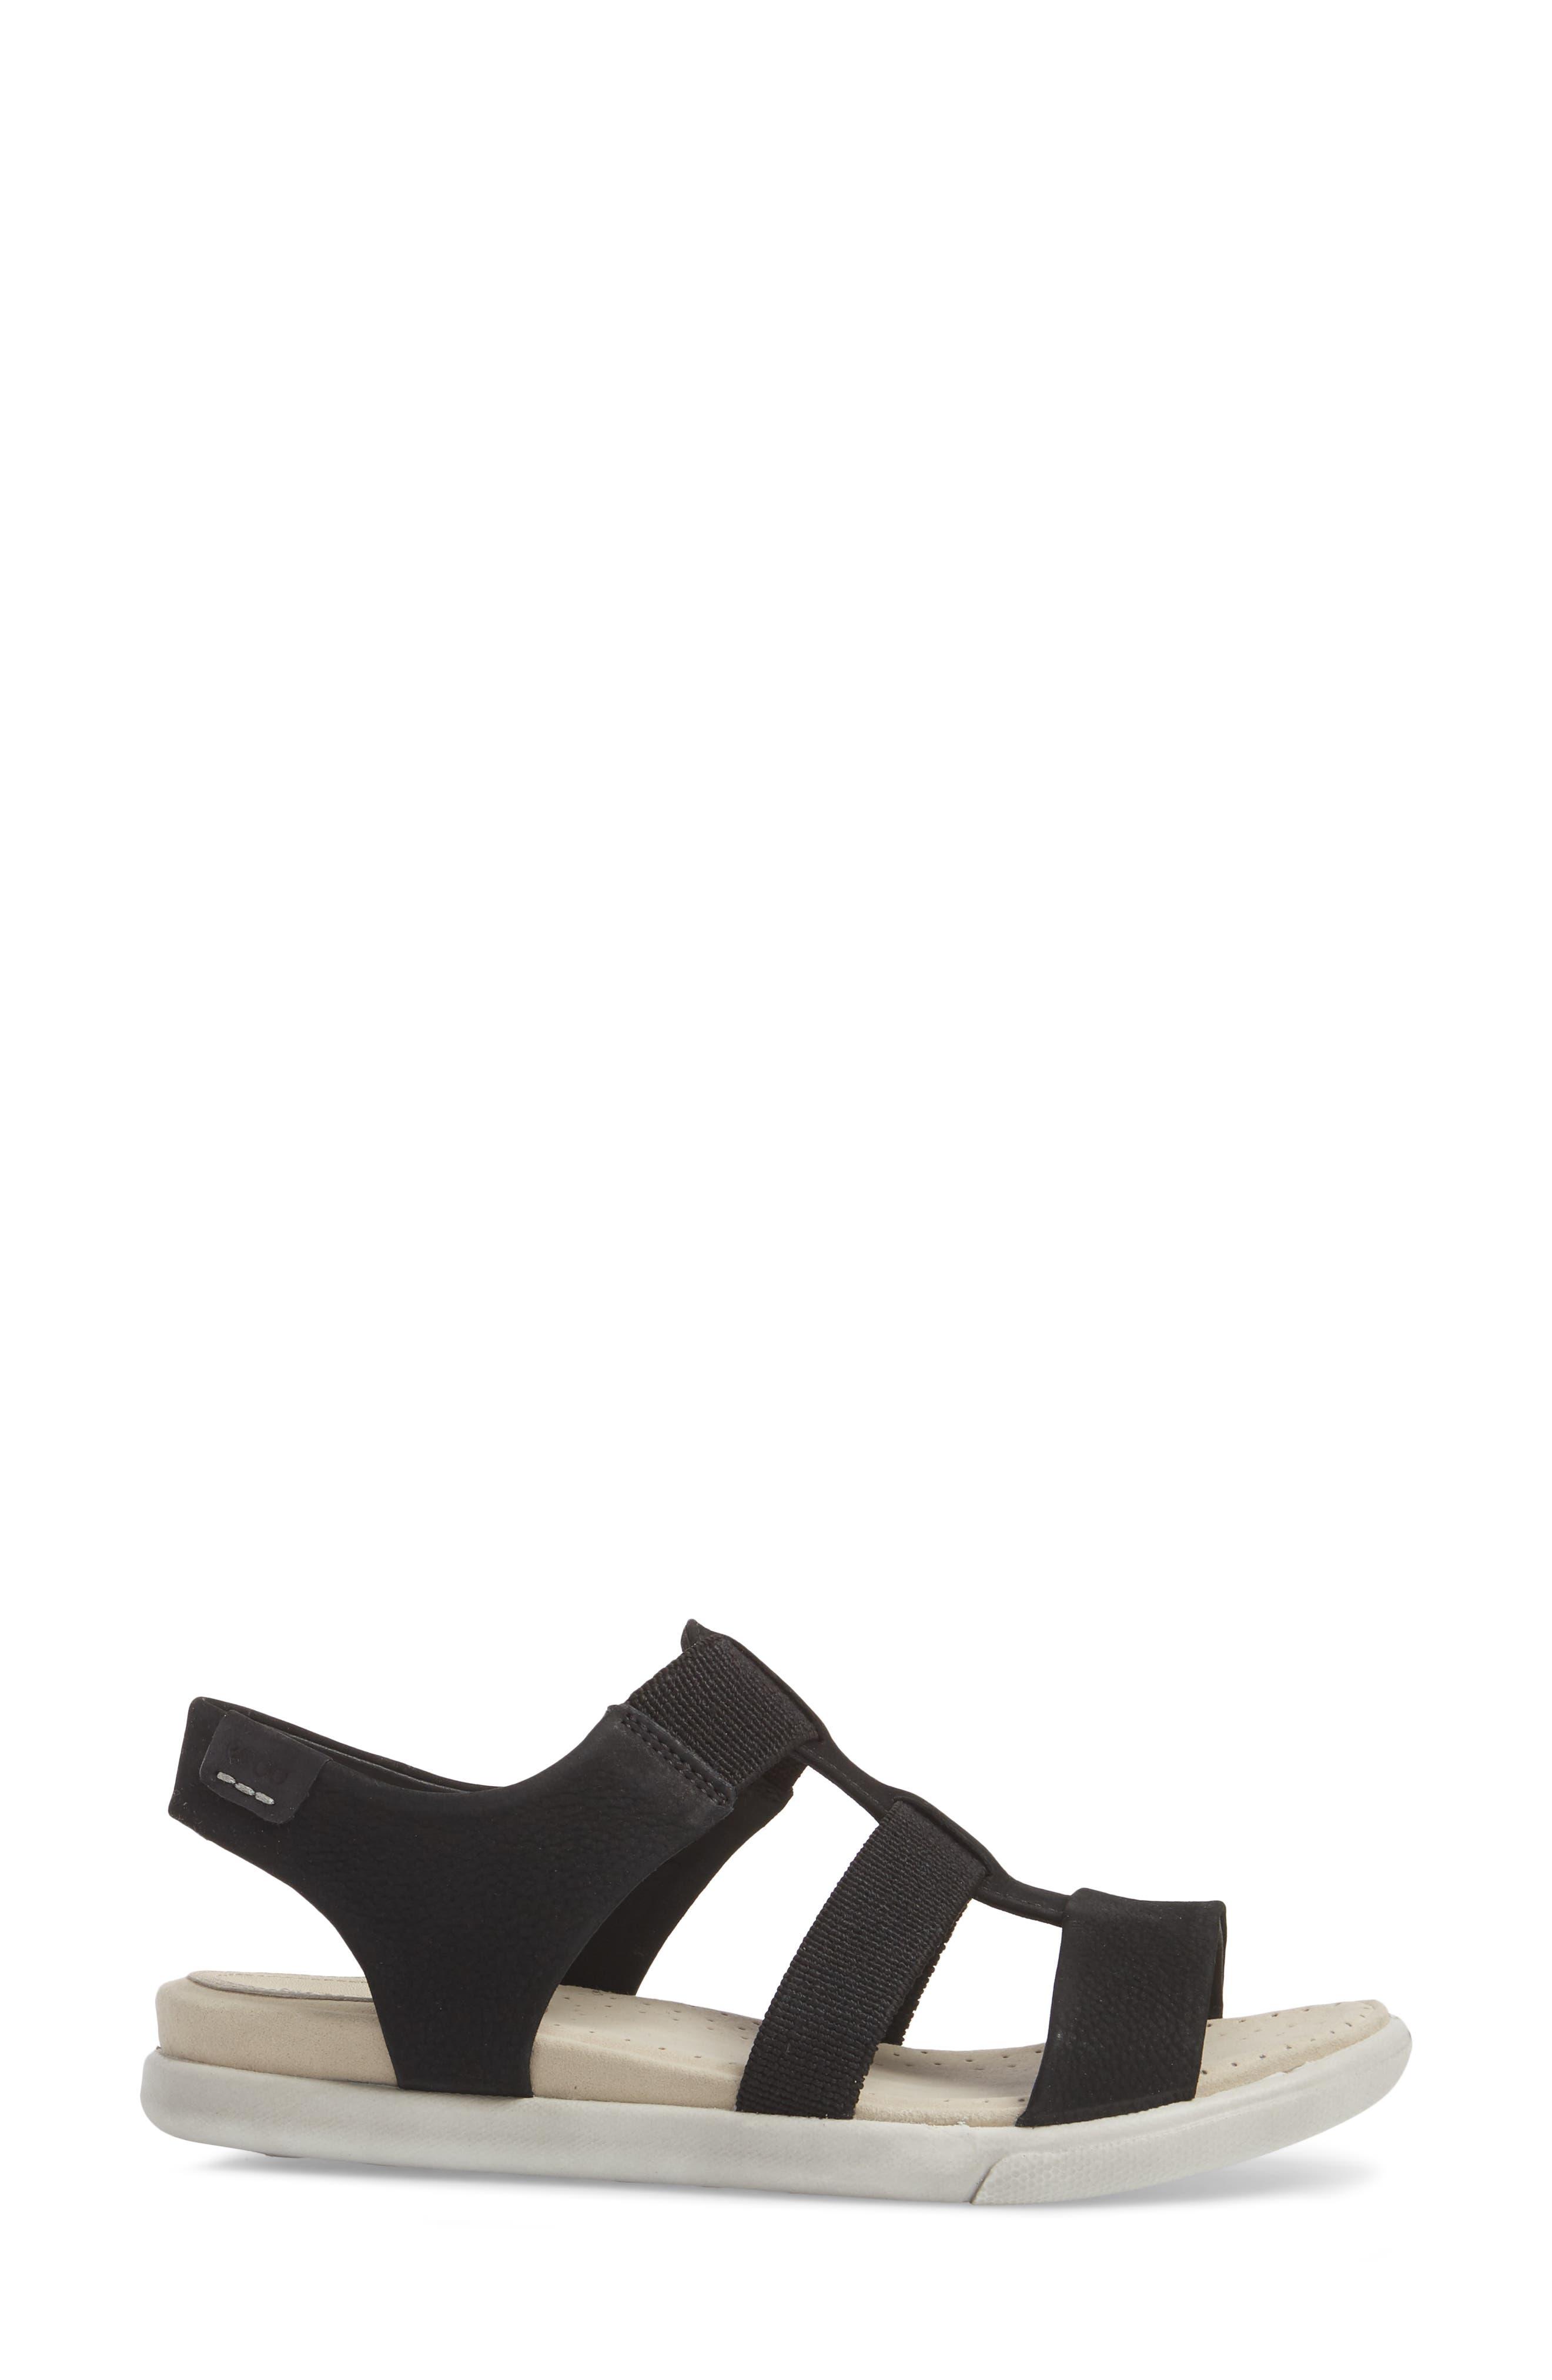 Damara Sandal,                             Alternate thumbnail 3, color,                             Black Leather